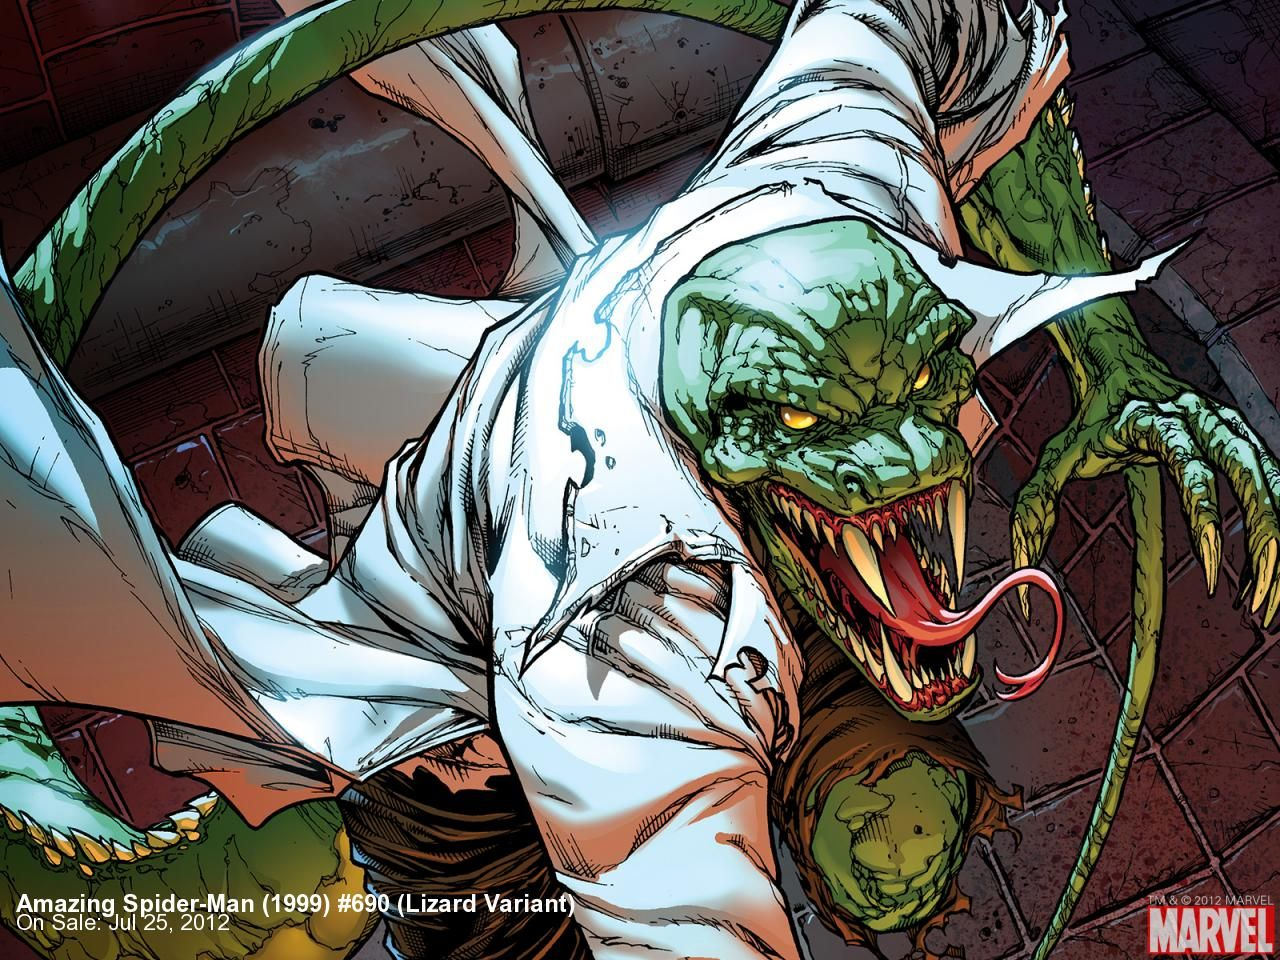 Best Wallpaper Marvel Lizard - 587e858ba7c22b1b776fa6fb014c3540  Gallery_961356.jpg